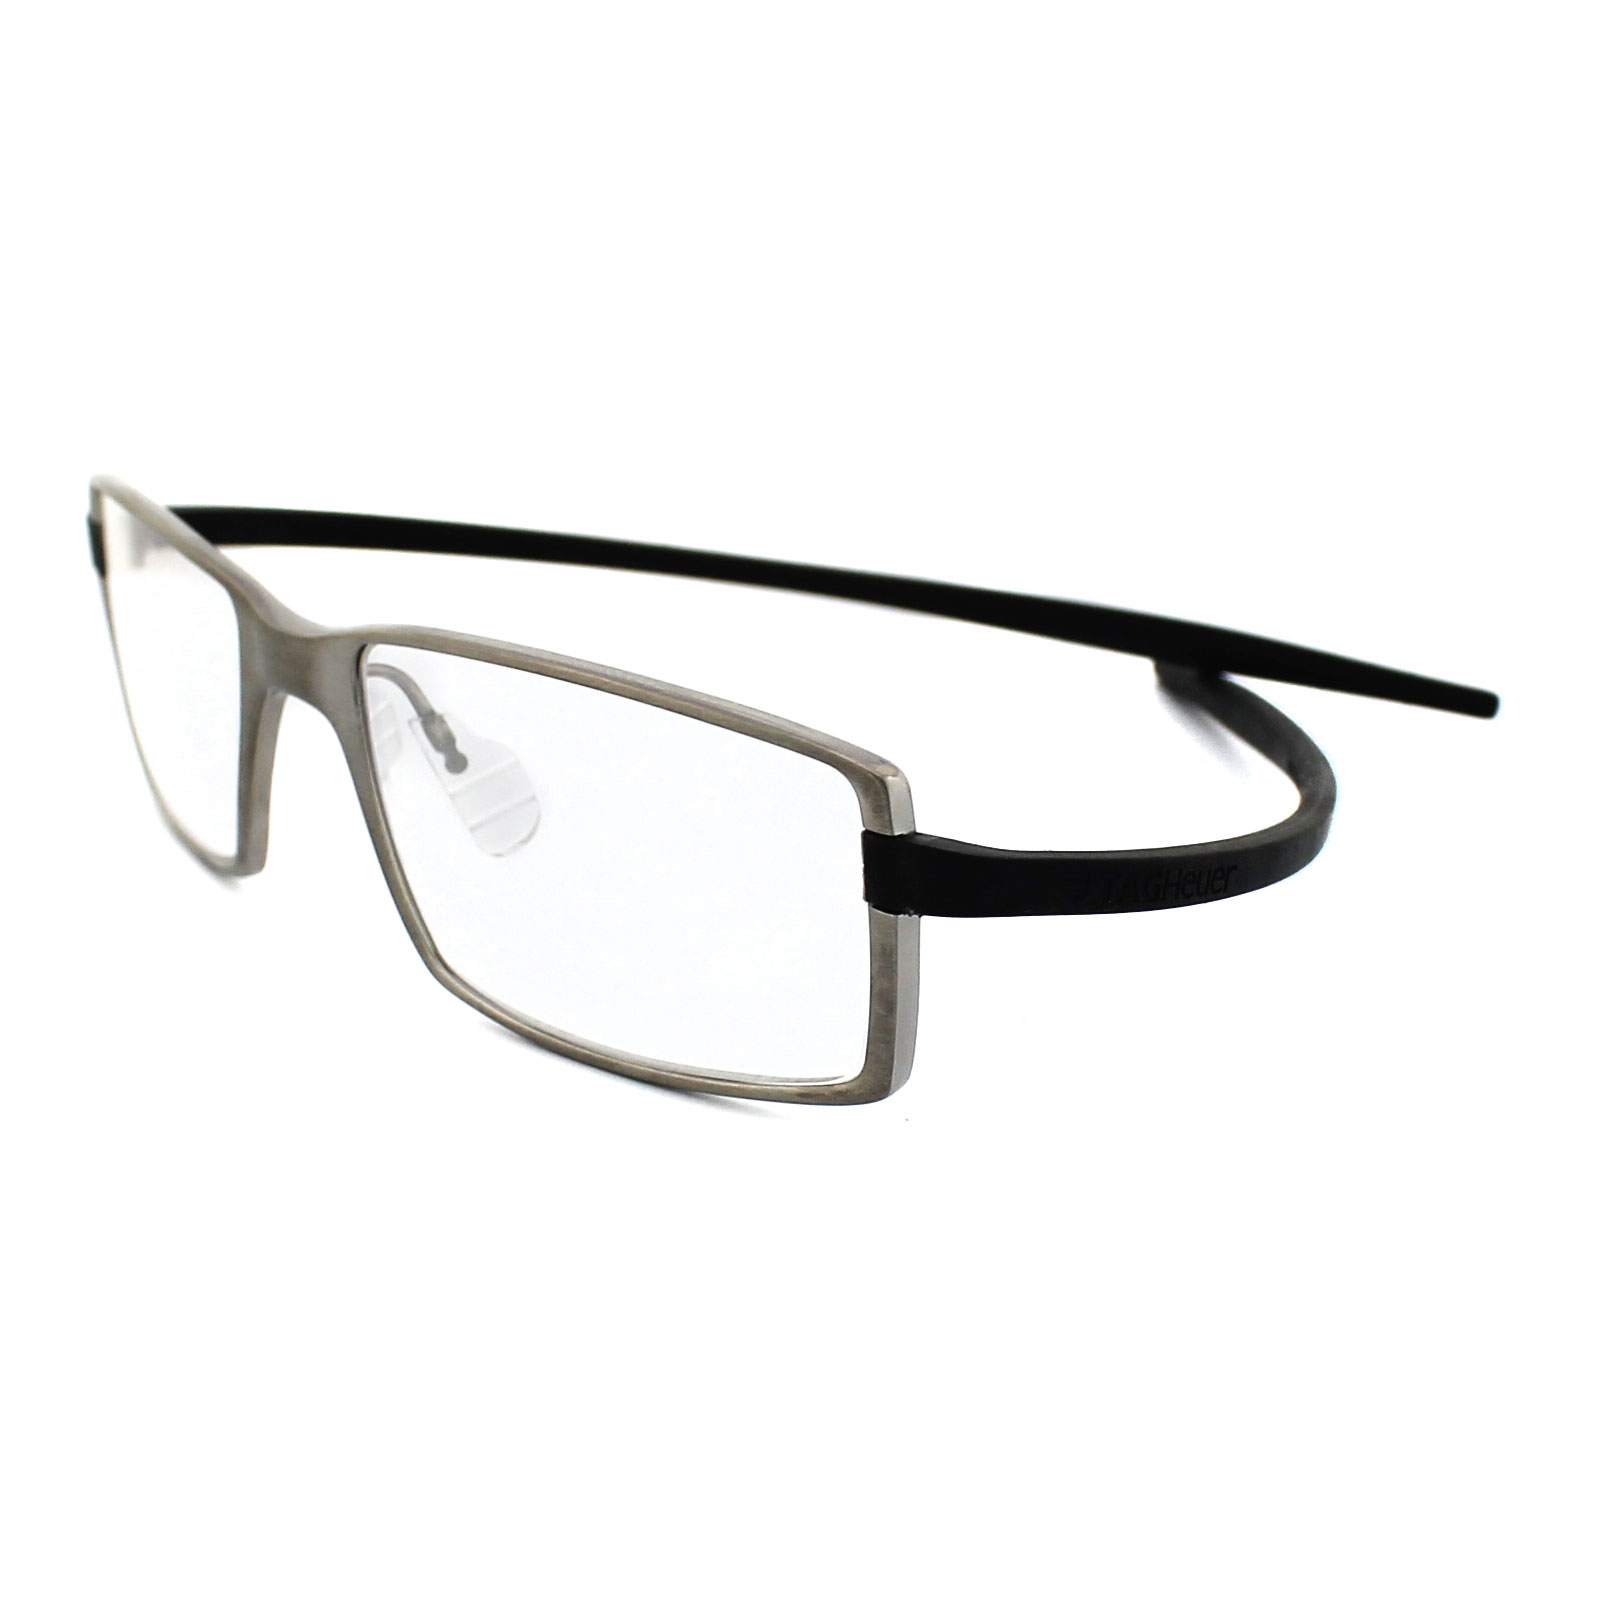 a4dc23ccfa5 Tag Heuer Reflex 2 Rimless 3744 Eyeglasses